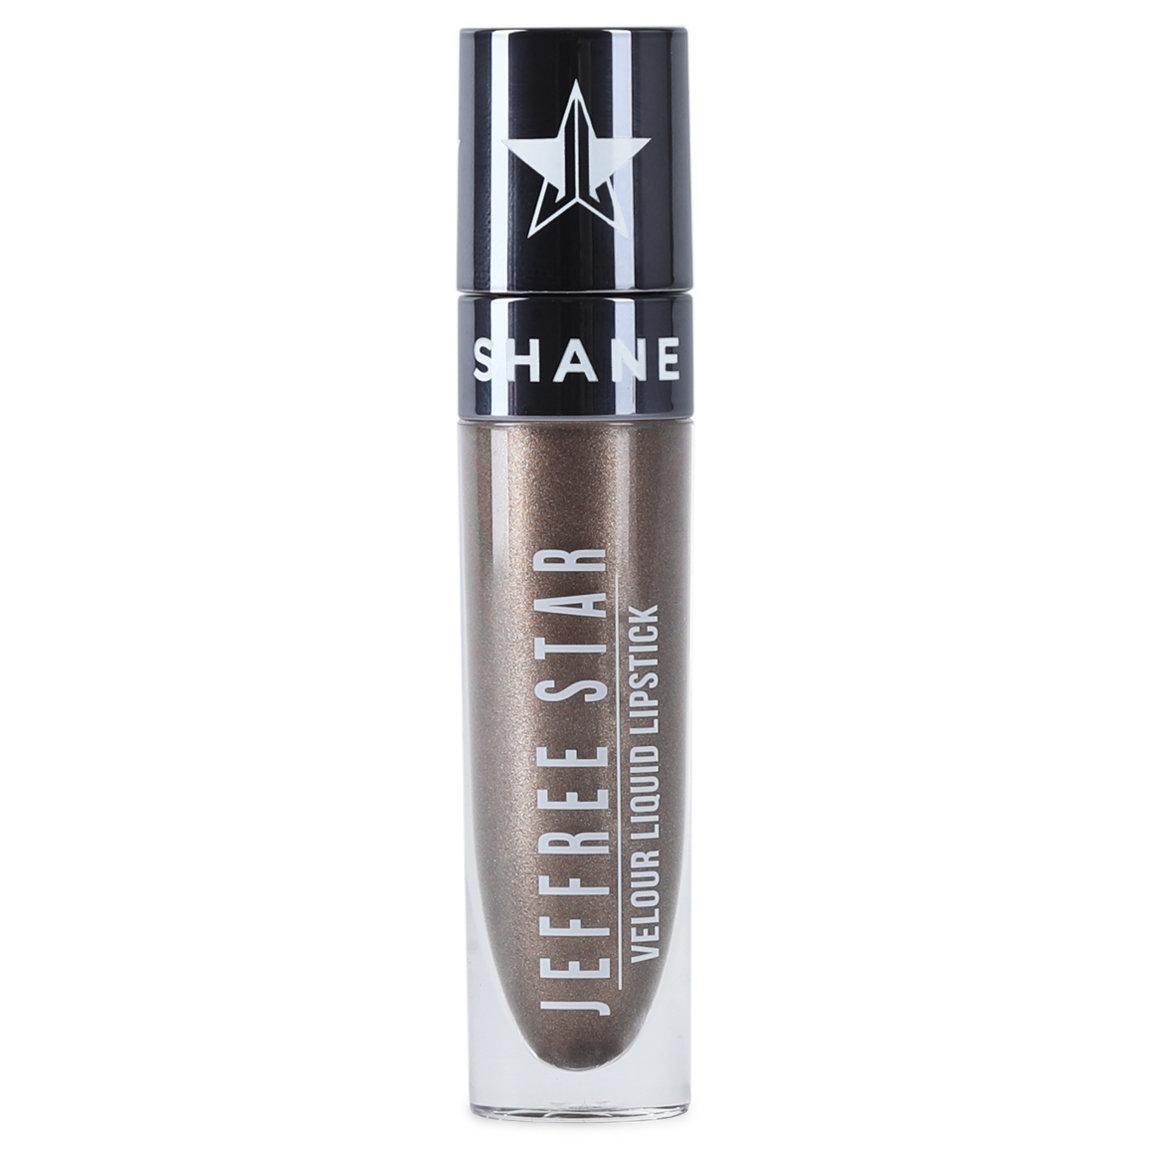 Jeffree Star Cosmetics Velour Liquid Lipstick Shane product swatch.